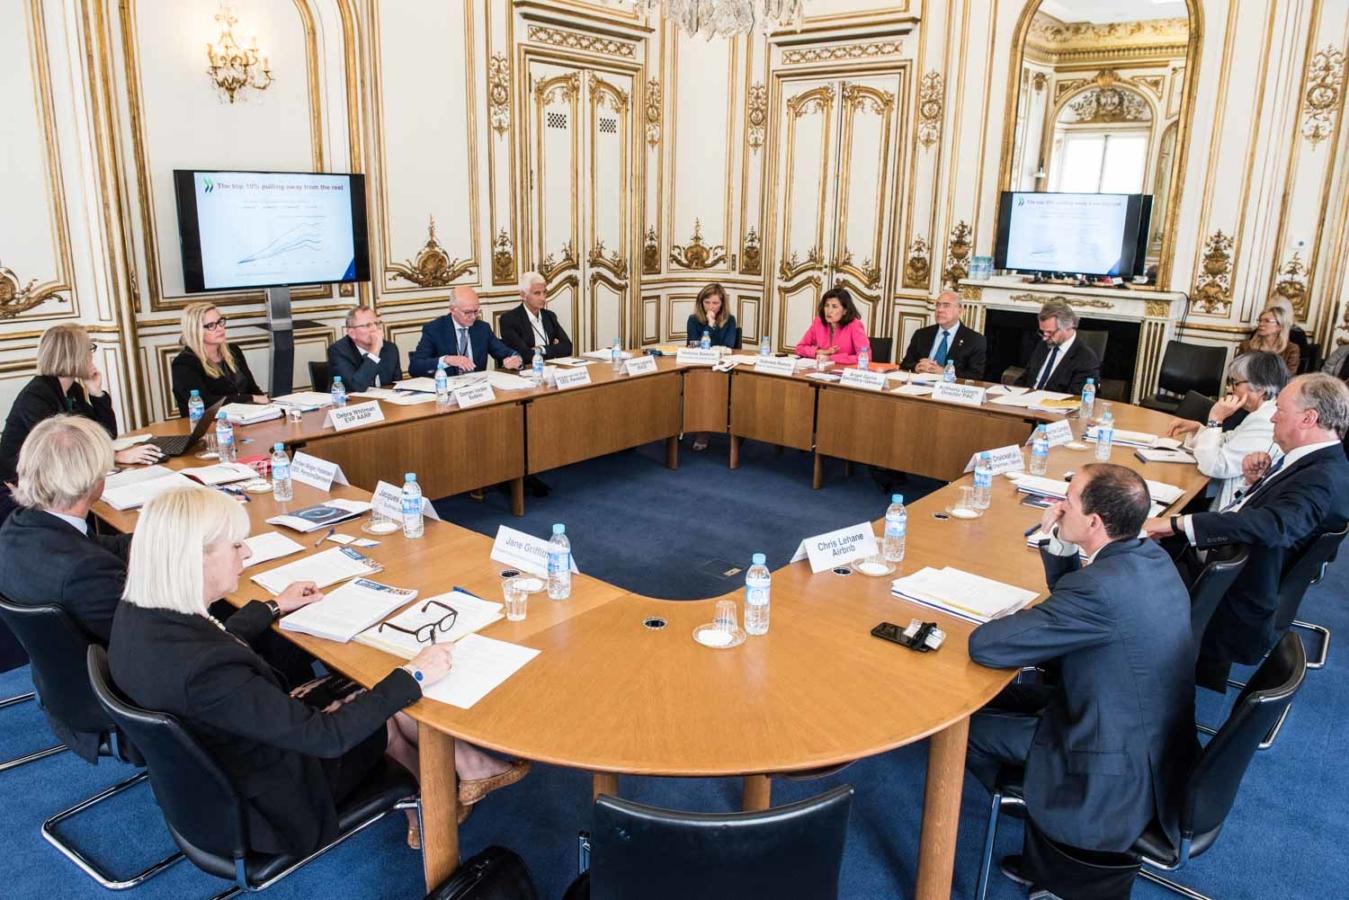 6 June 2017 - OECD Forum 2017: OECD Forum 2017: Forum CEO/ Business Round table.  OECD, Paris, France.Photo: OECD/Hubert  Raguet